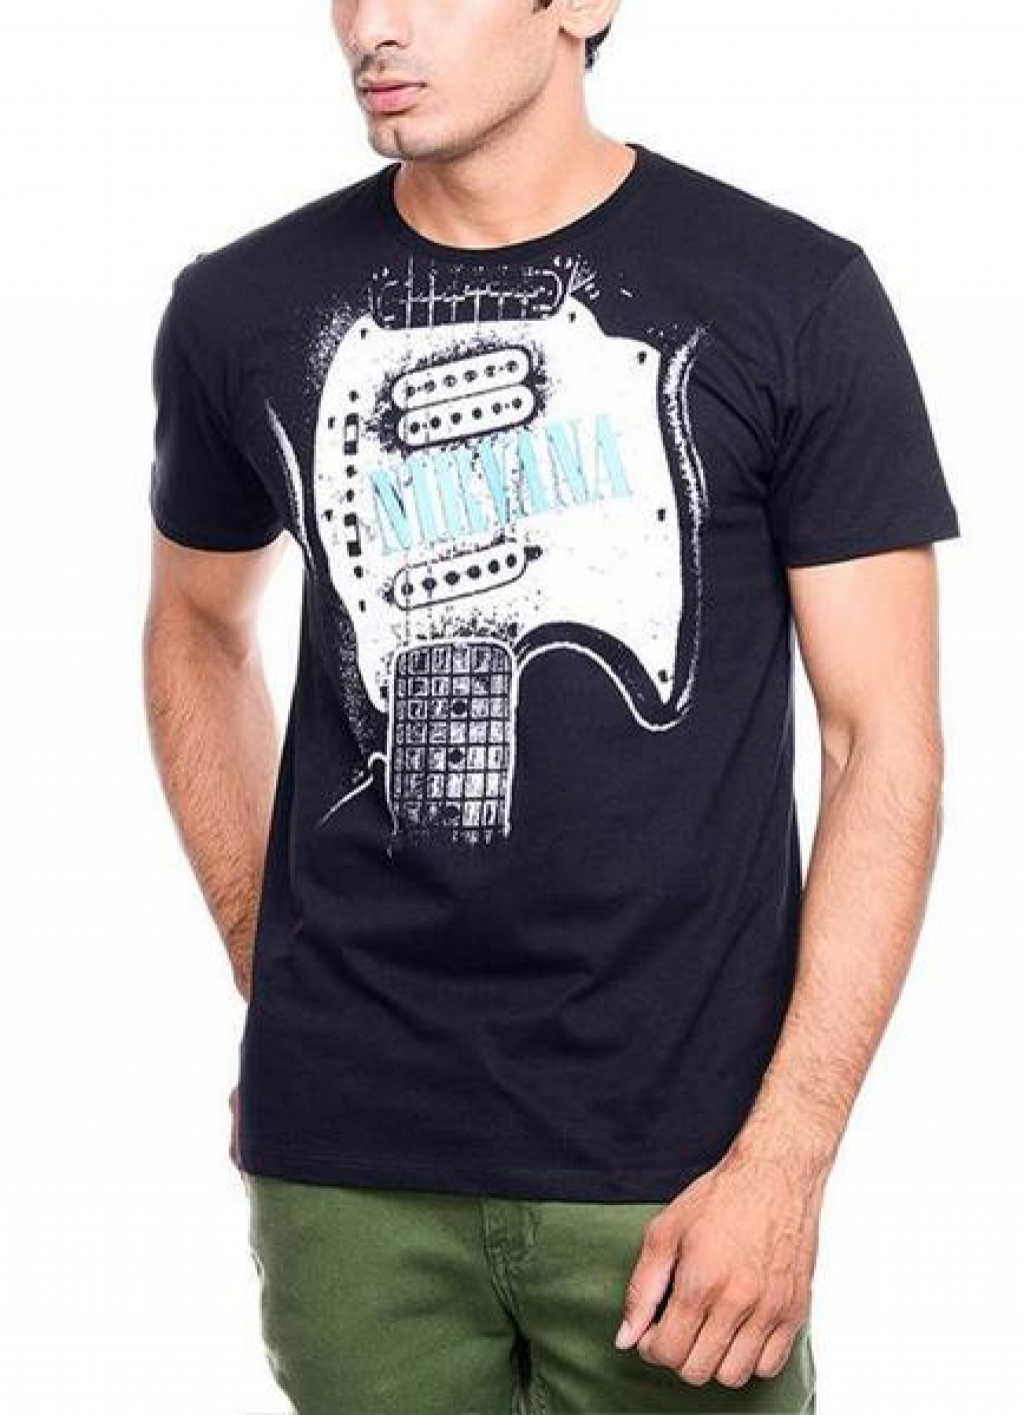 14992574590_Affordable_Nirvana_Never_Mind_Black_Half_Sleeve_Men_T-Shirt.jpg